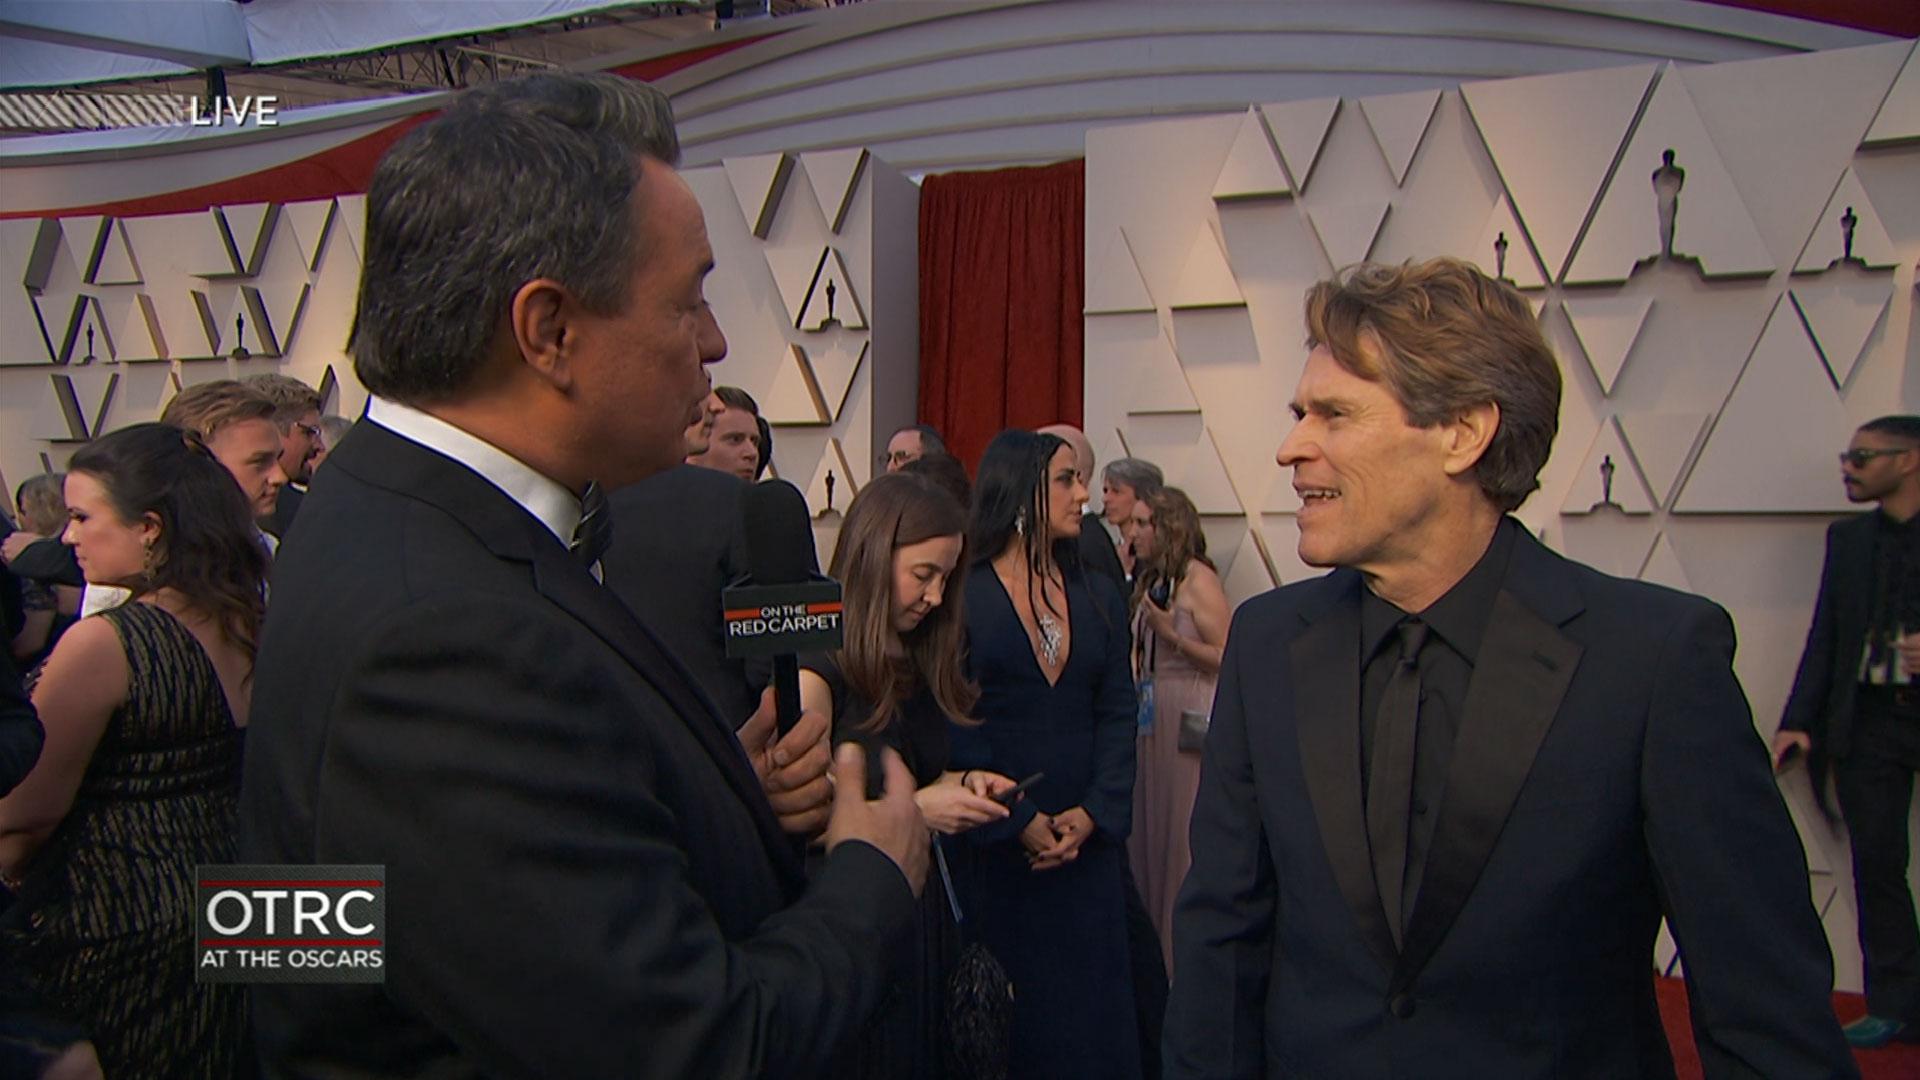 Frekuensi siaran Academy Awards HD PAL di satelit  Terbaru